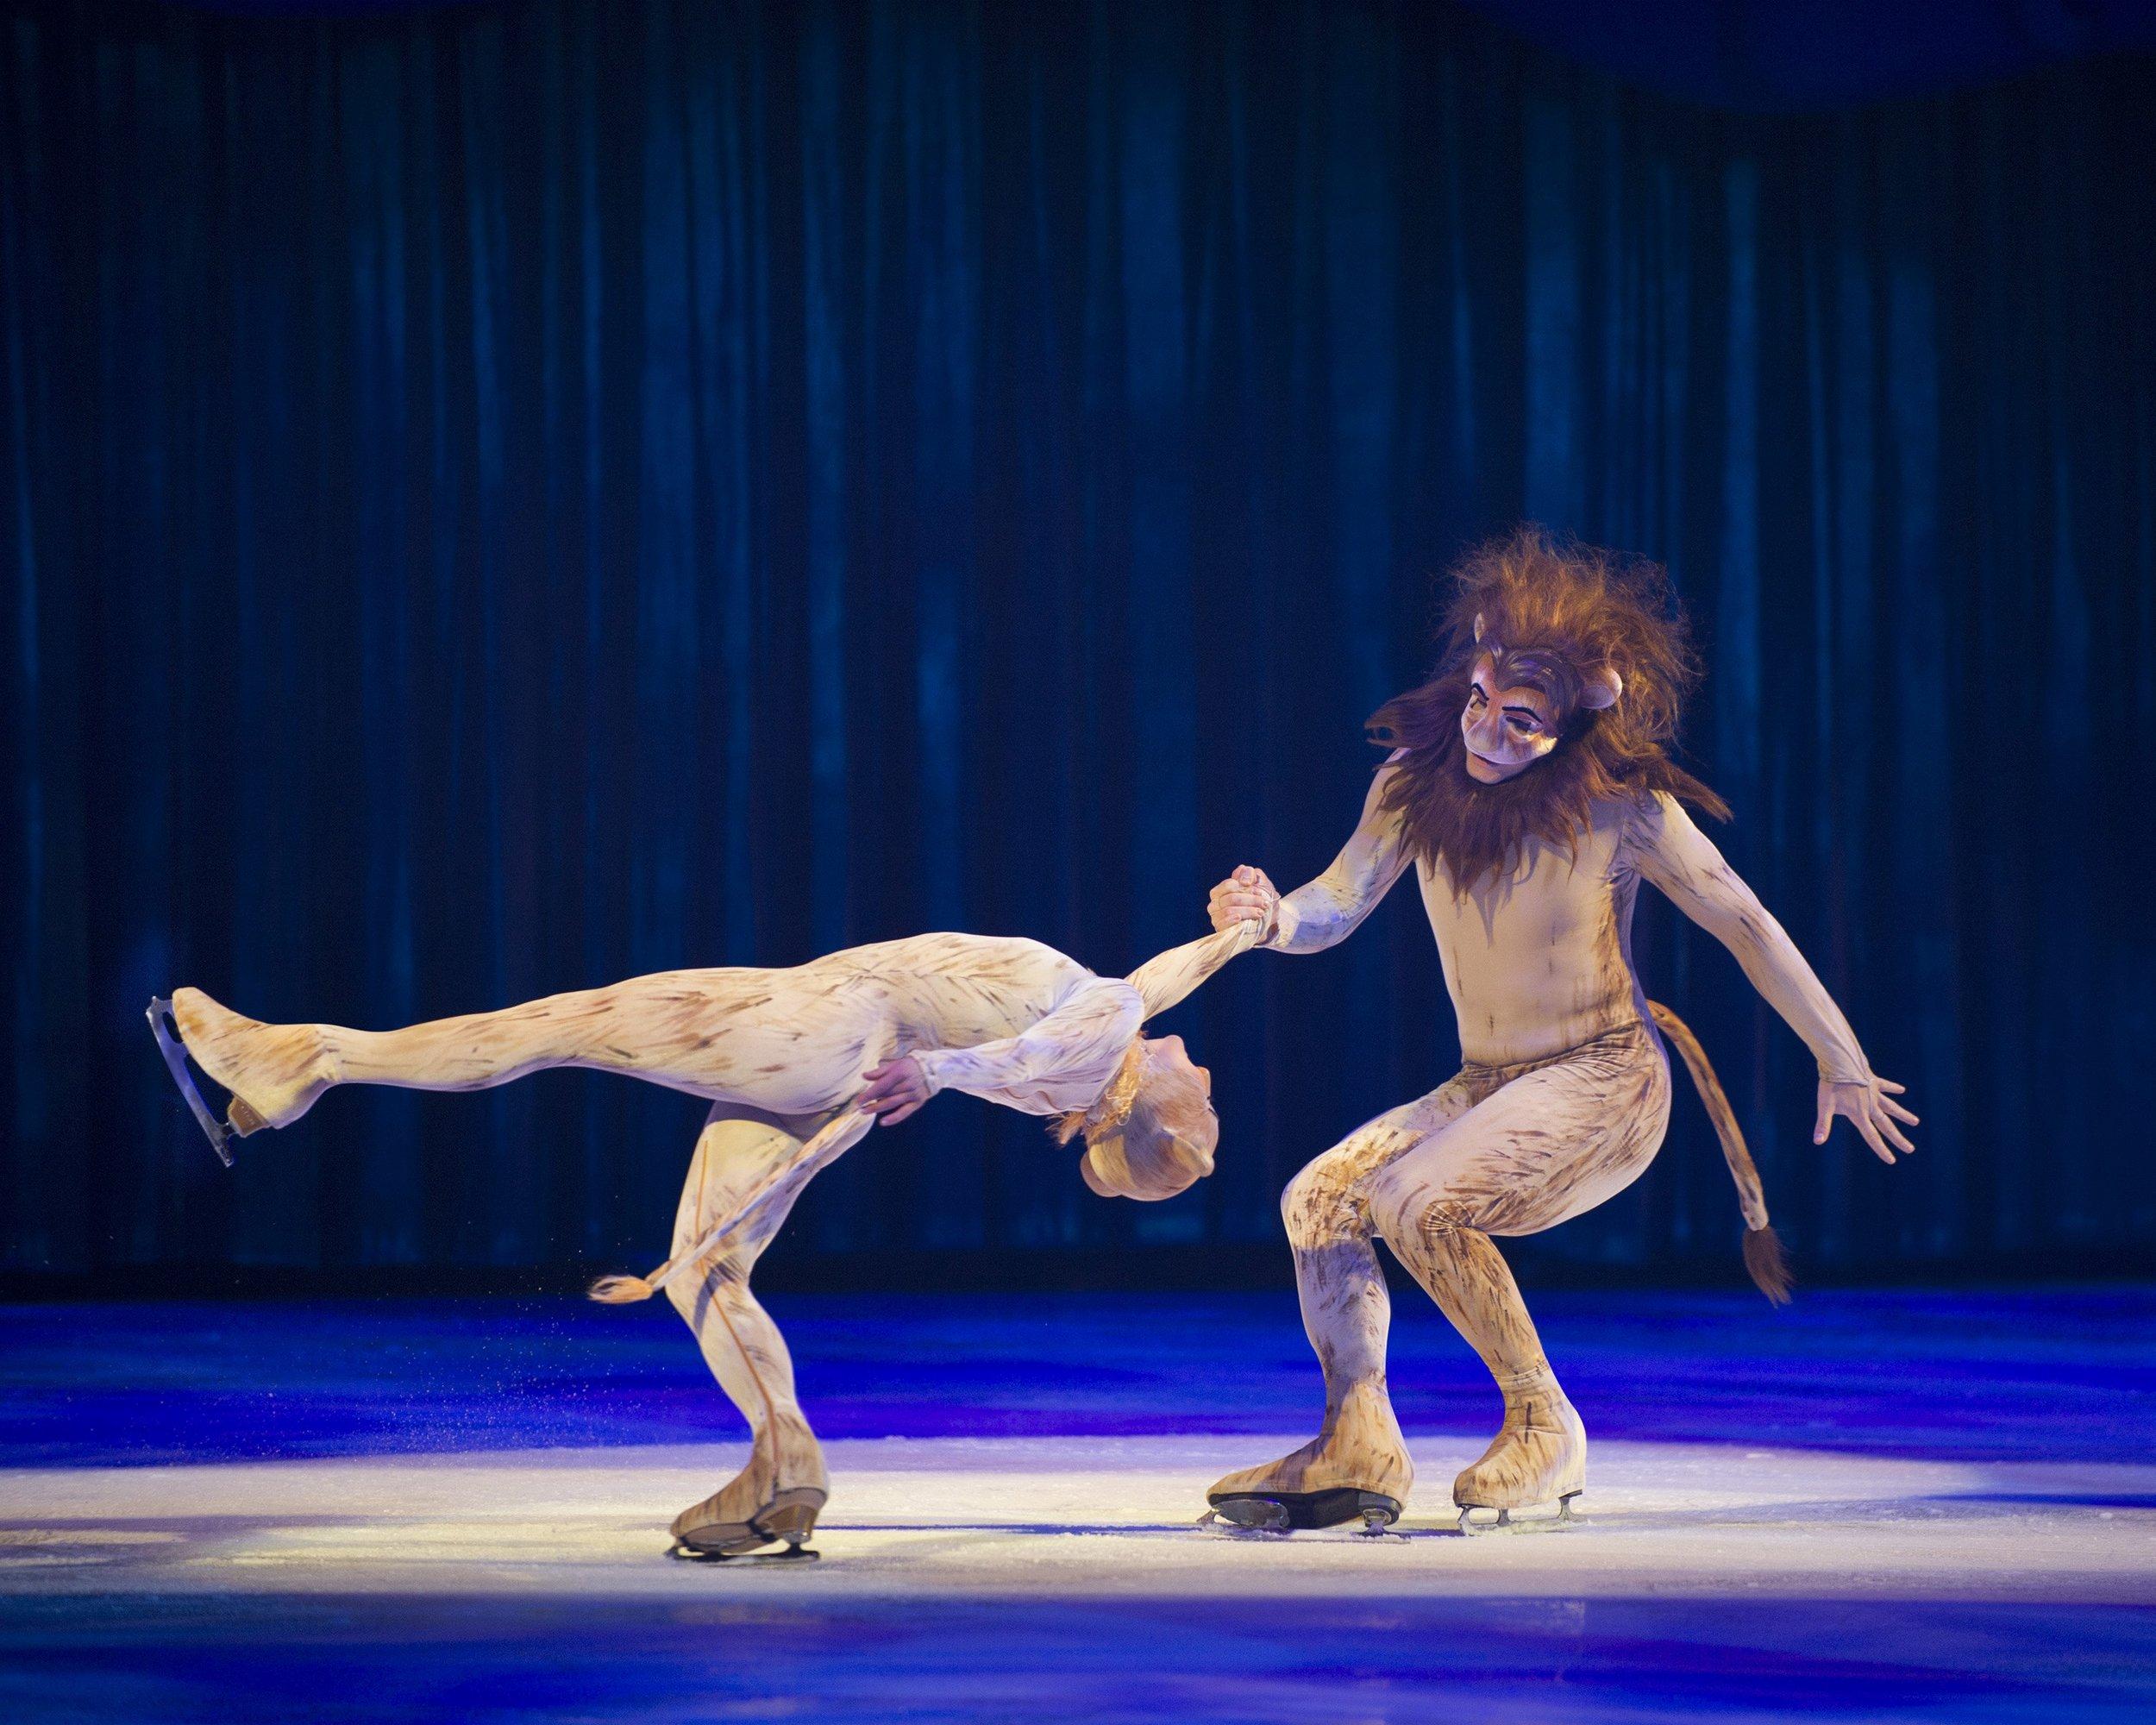 Disney On Ice presents Passport to Adventure - The Lion King